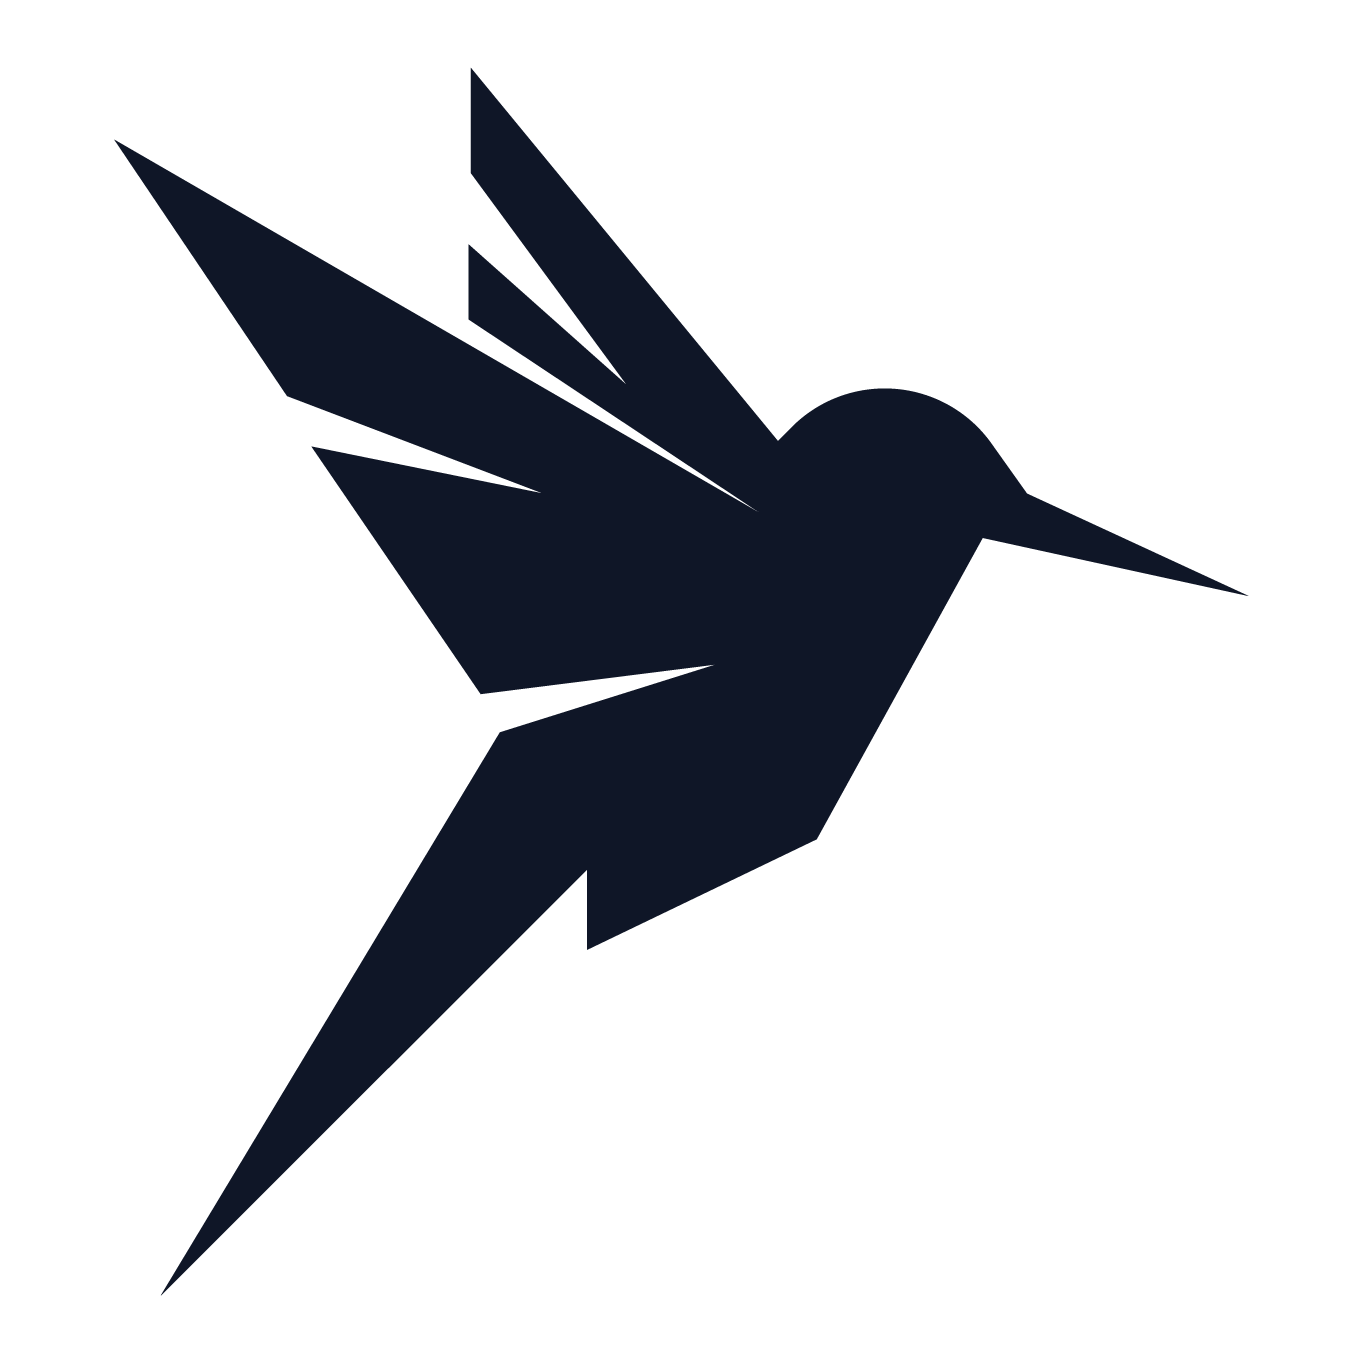 The Atticus legal tech logo, in black